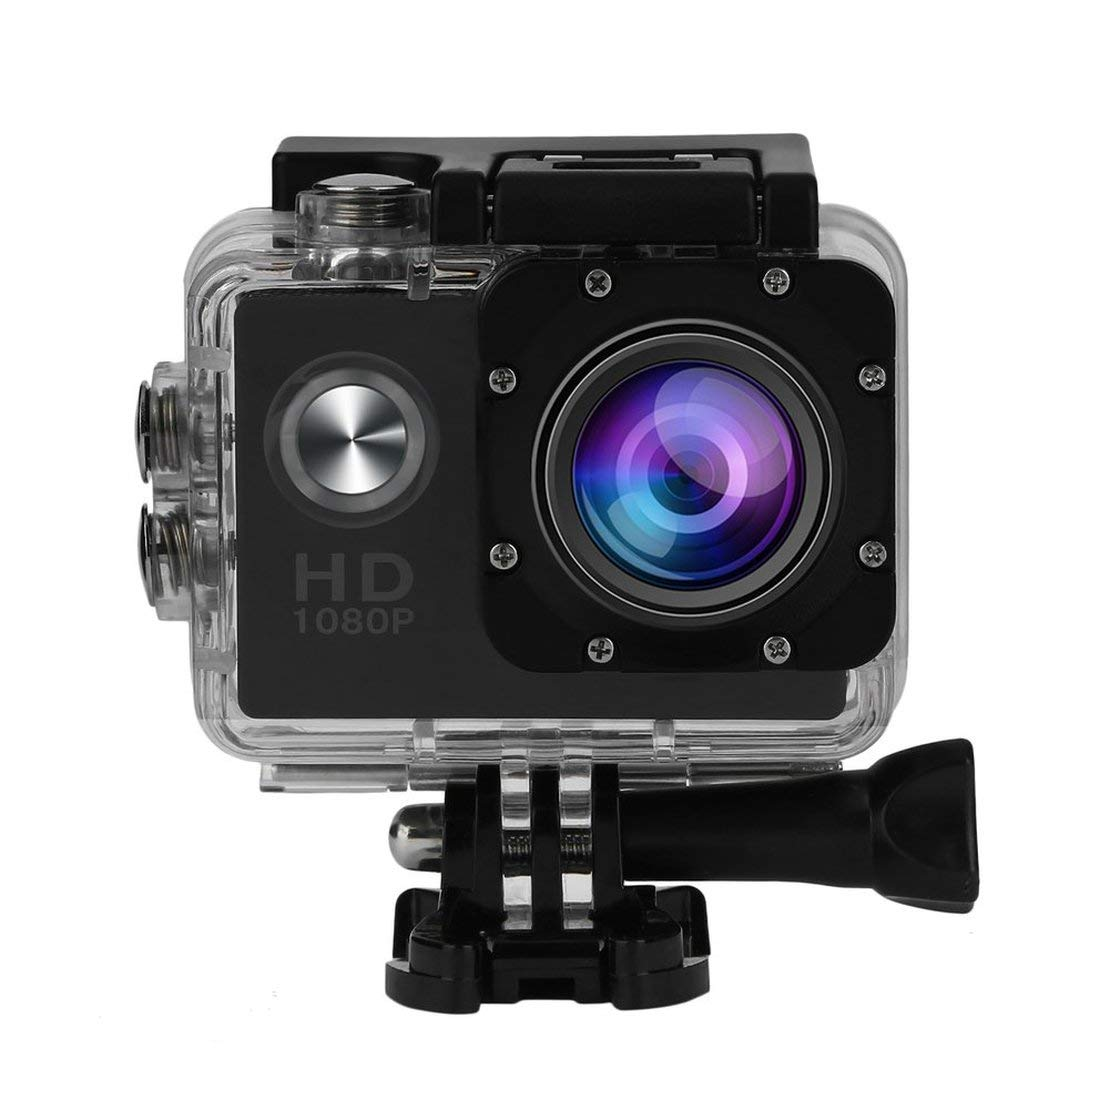 Laurelmartina Cámara de acción SJ5000 Sports CAM Full HD 1080P 30m Impermeable Pantalla LCD de 2.0 Pulgadas Mini Deportes DV Videocámara con Accesorios de cámara